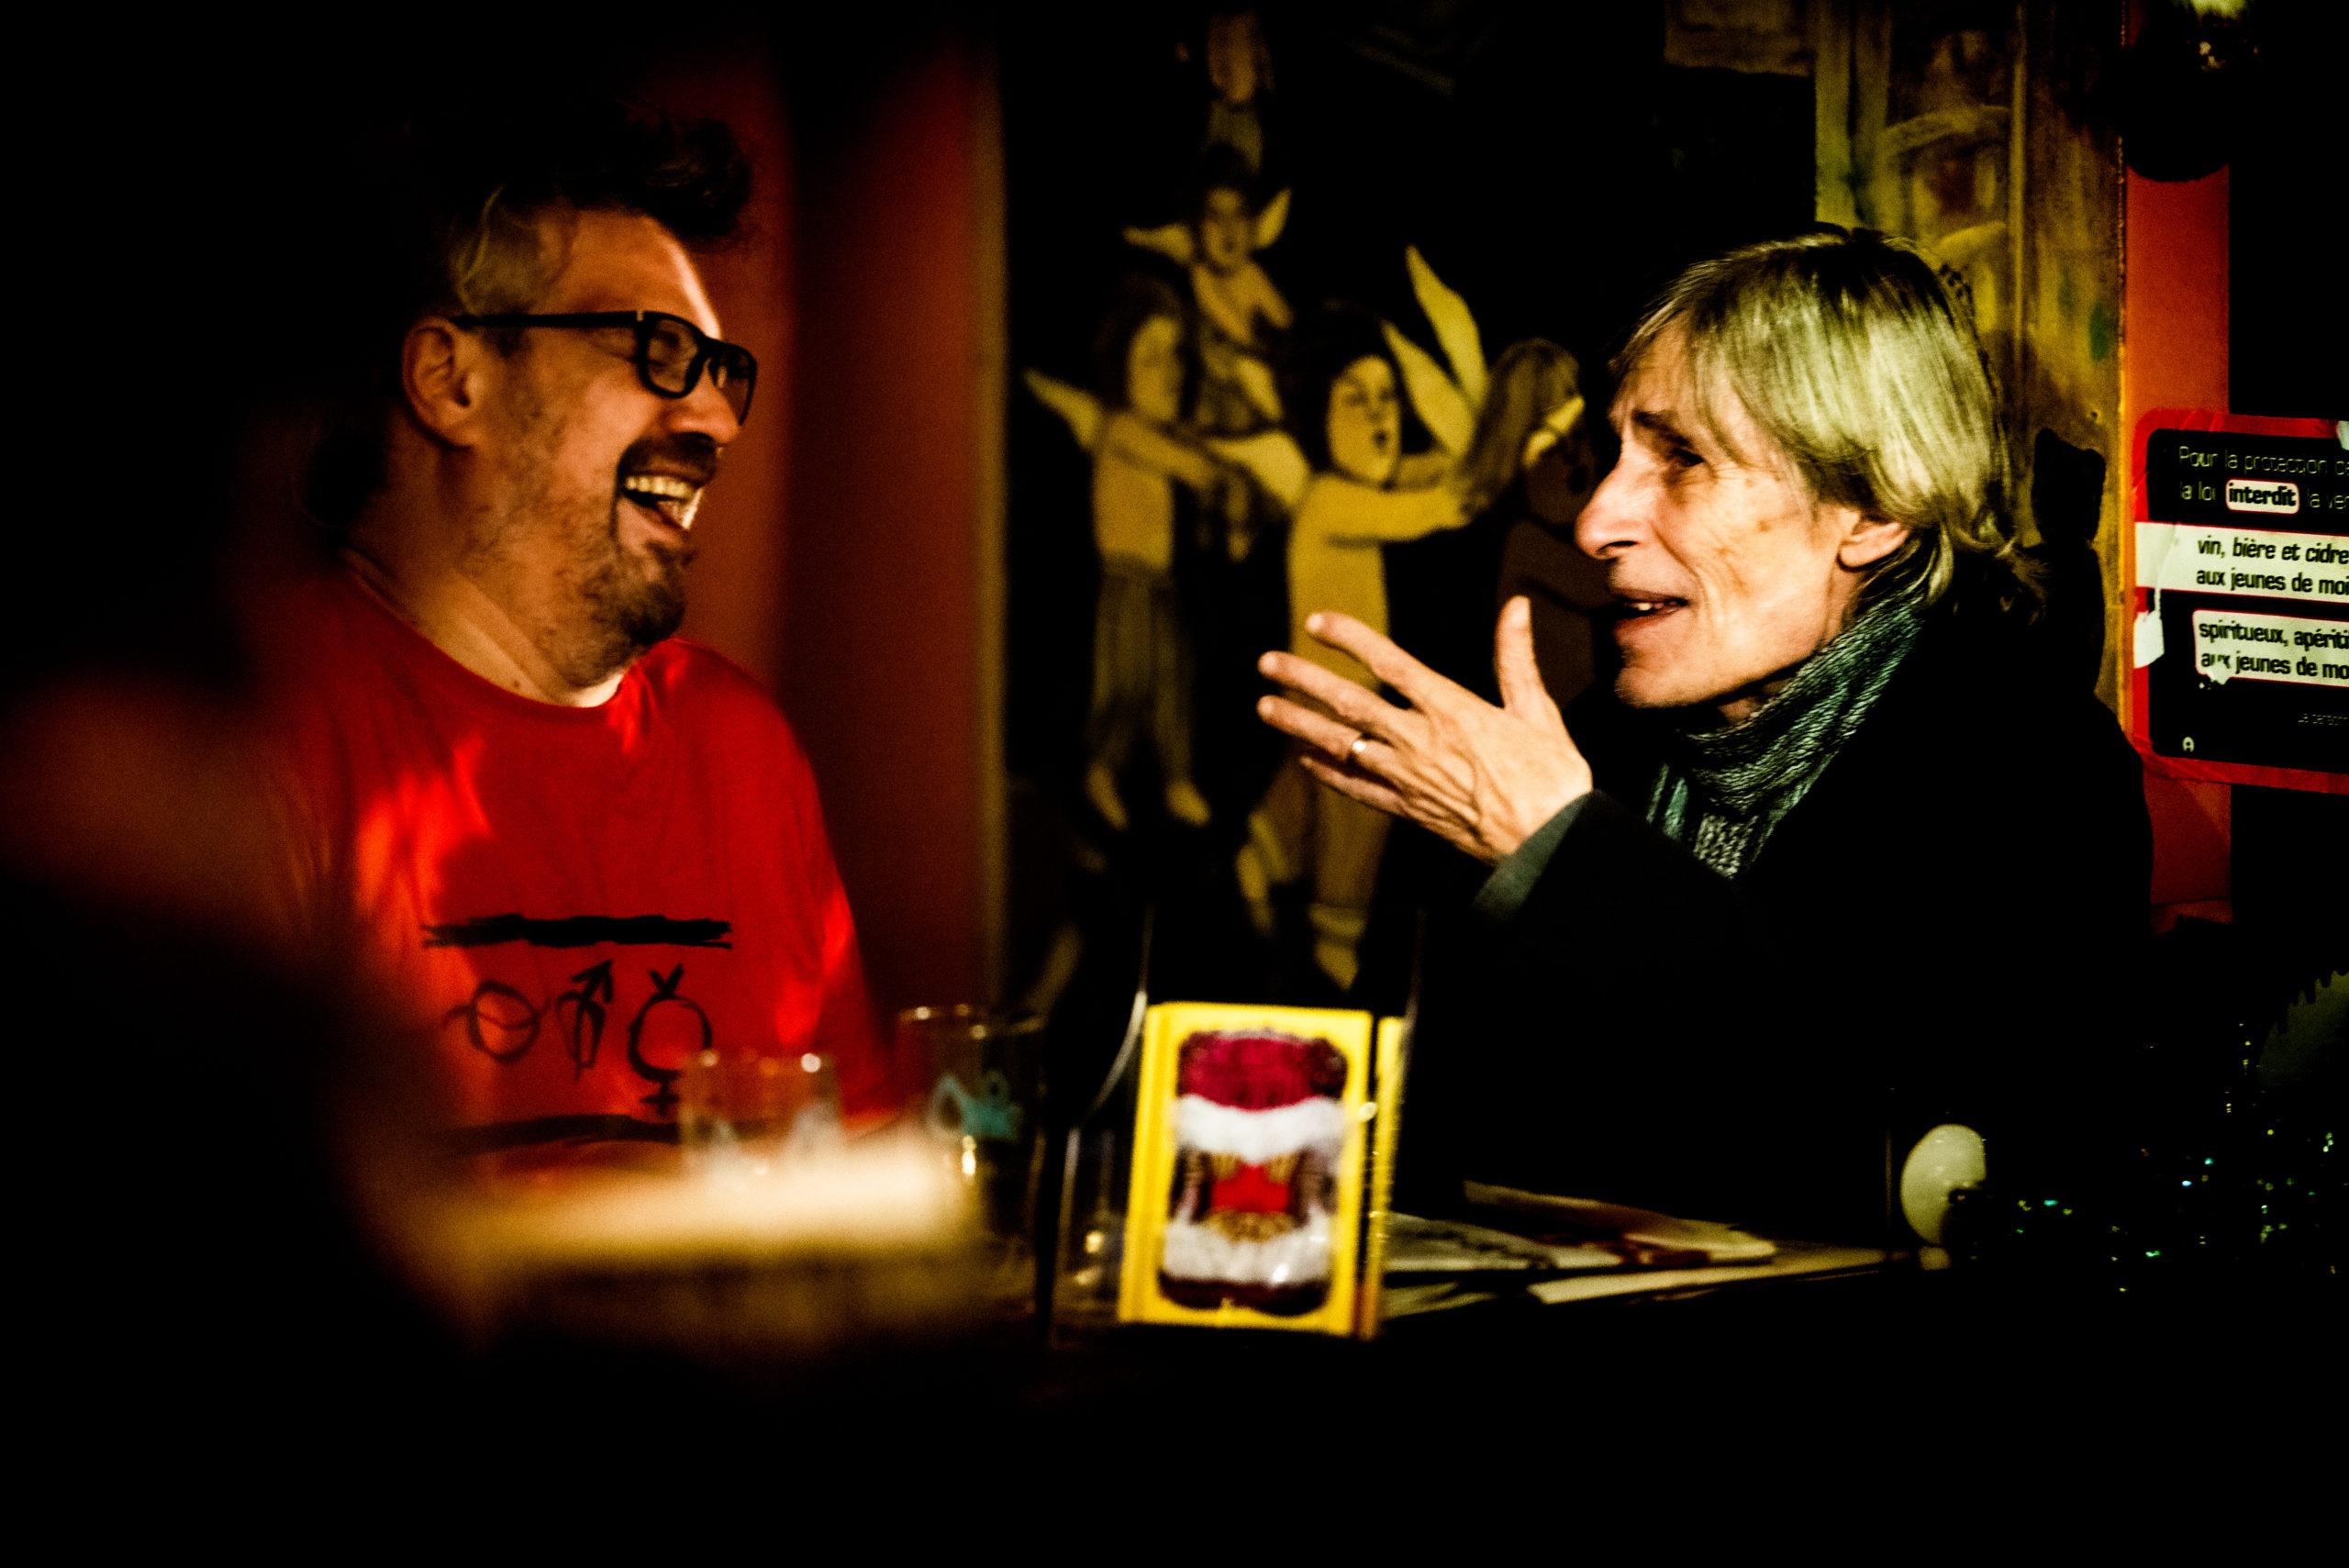 Sébastien Gabriel & Yoanna · Festival des 40 ans @ La Bretelle · nov. 2019 · Olivier Carrard